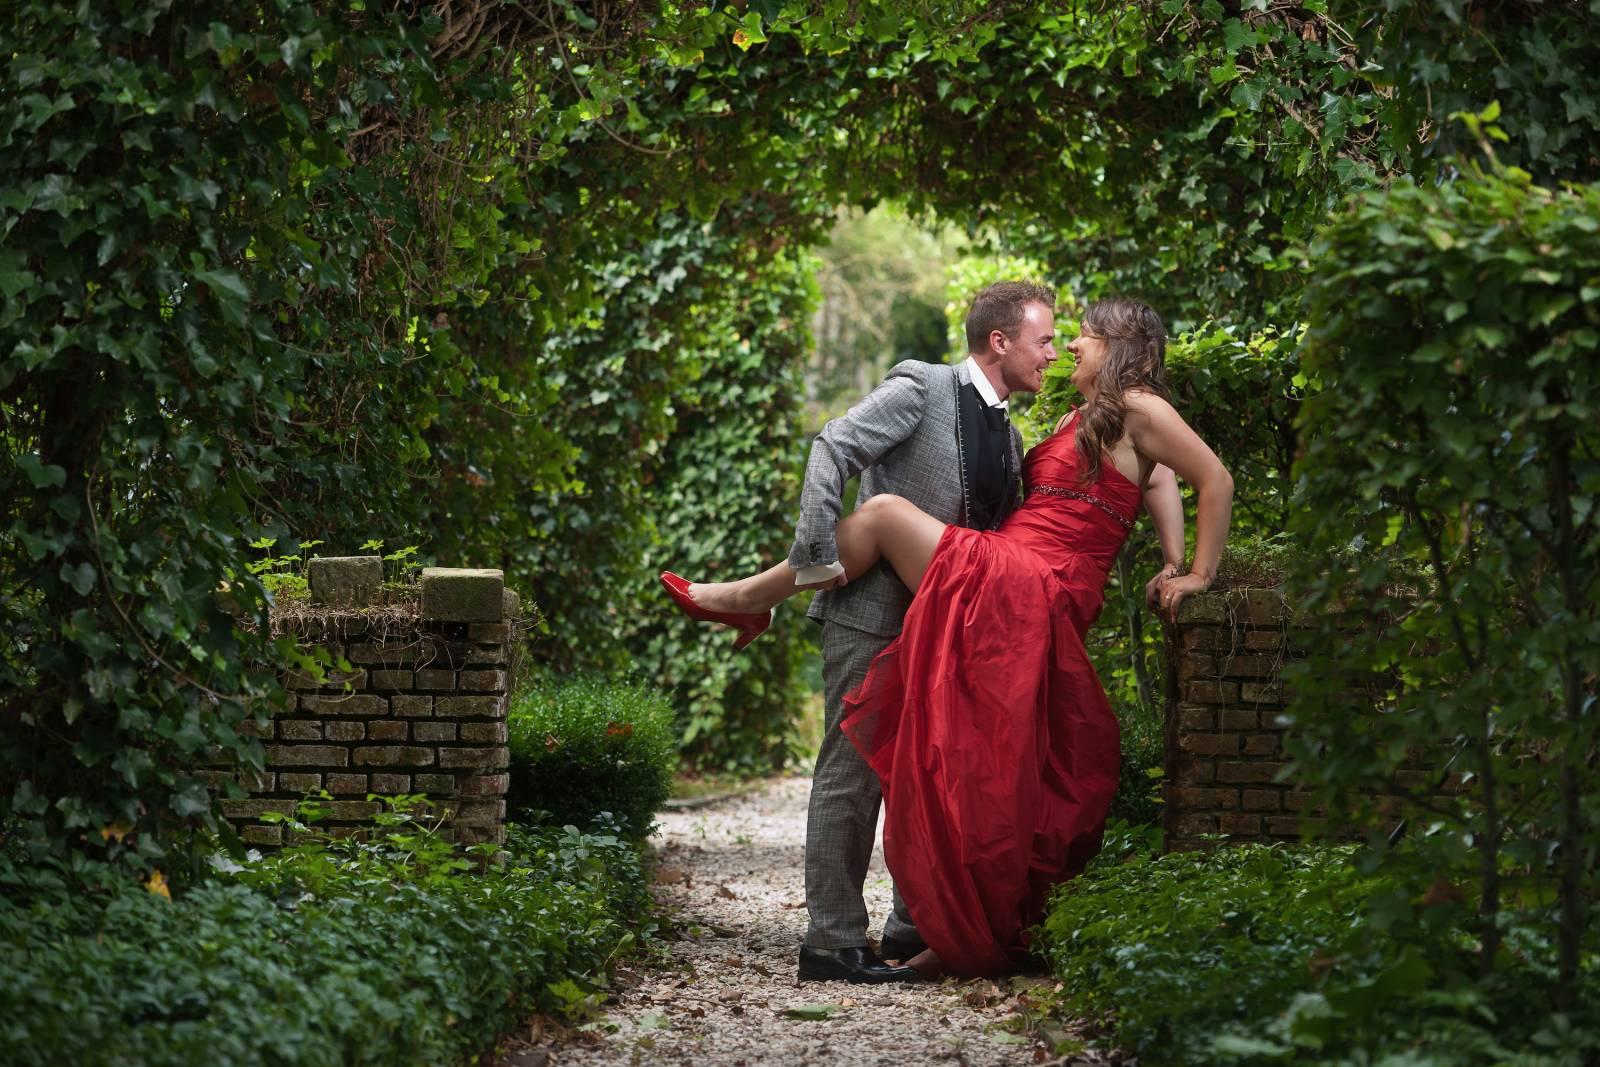 Foto Meeuw - House of Weddings - 11